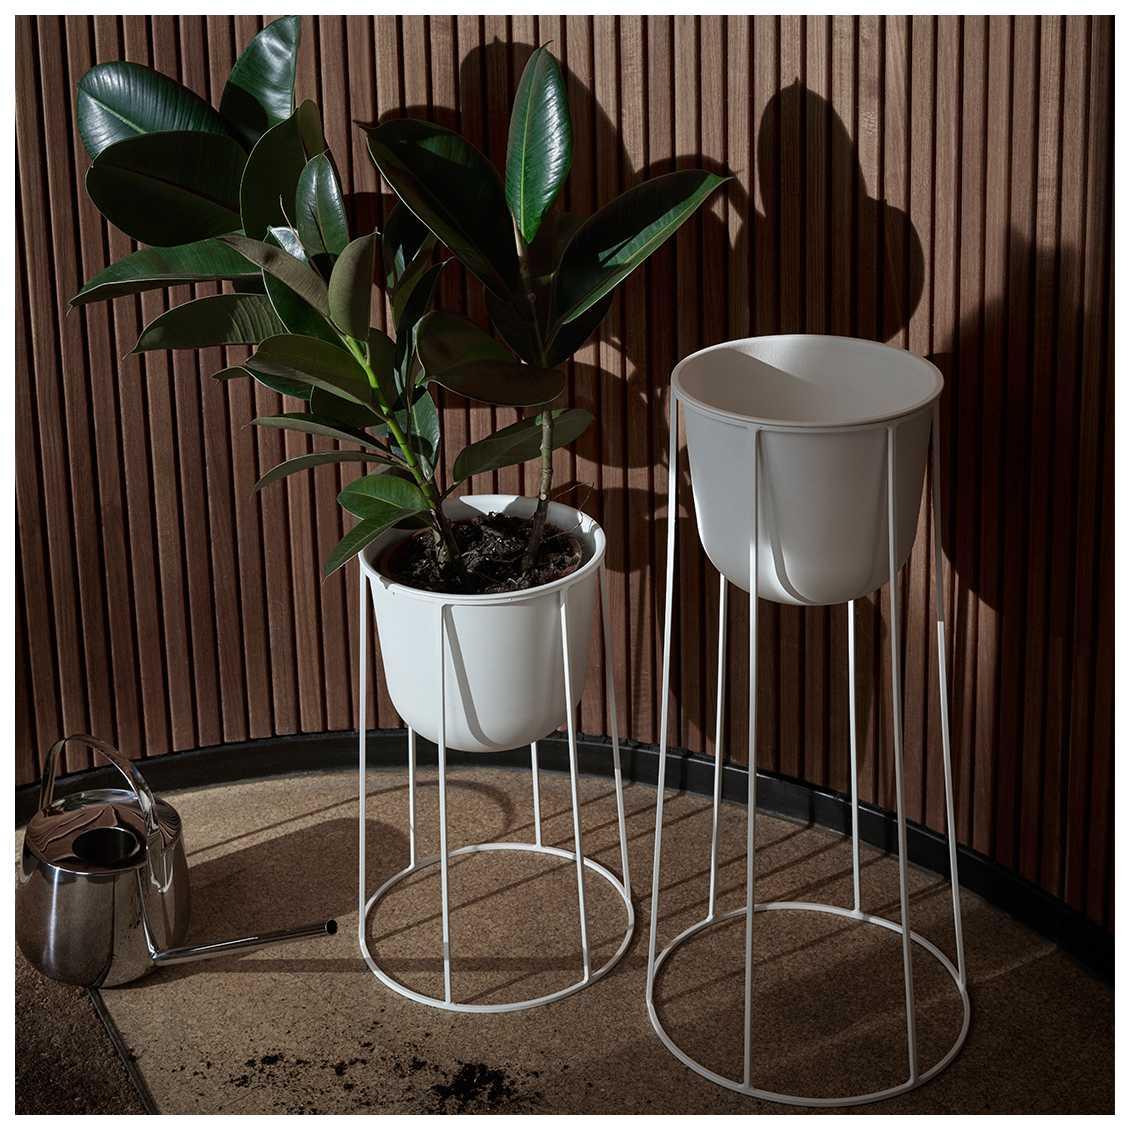 Menu Wire Pot en plantenbakken